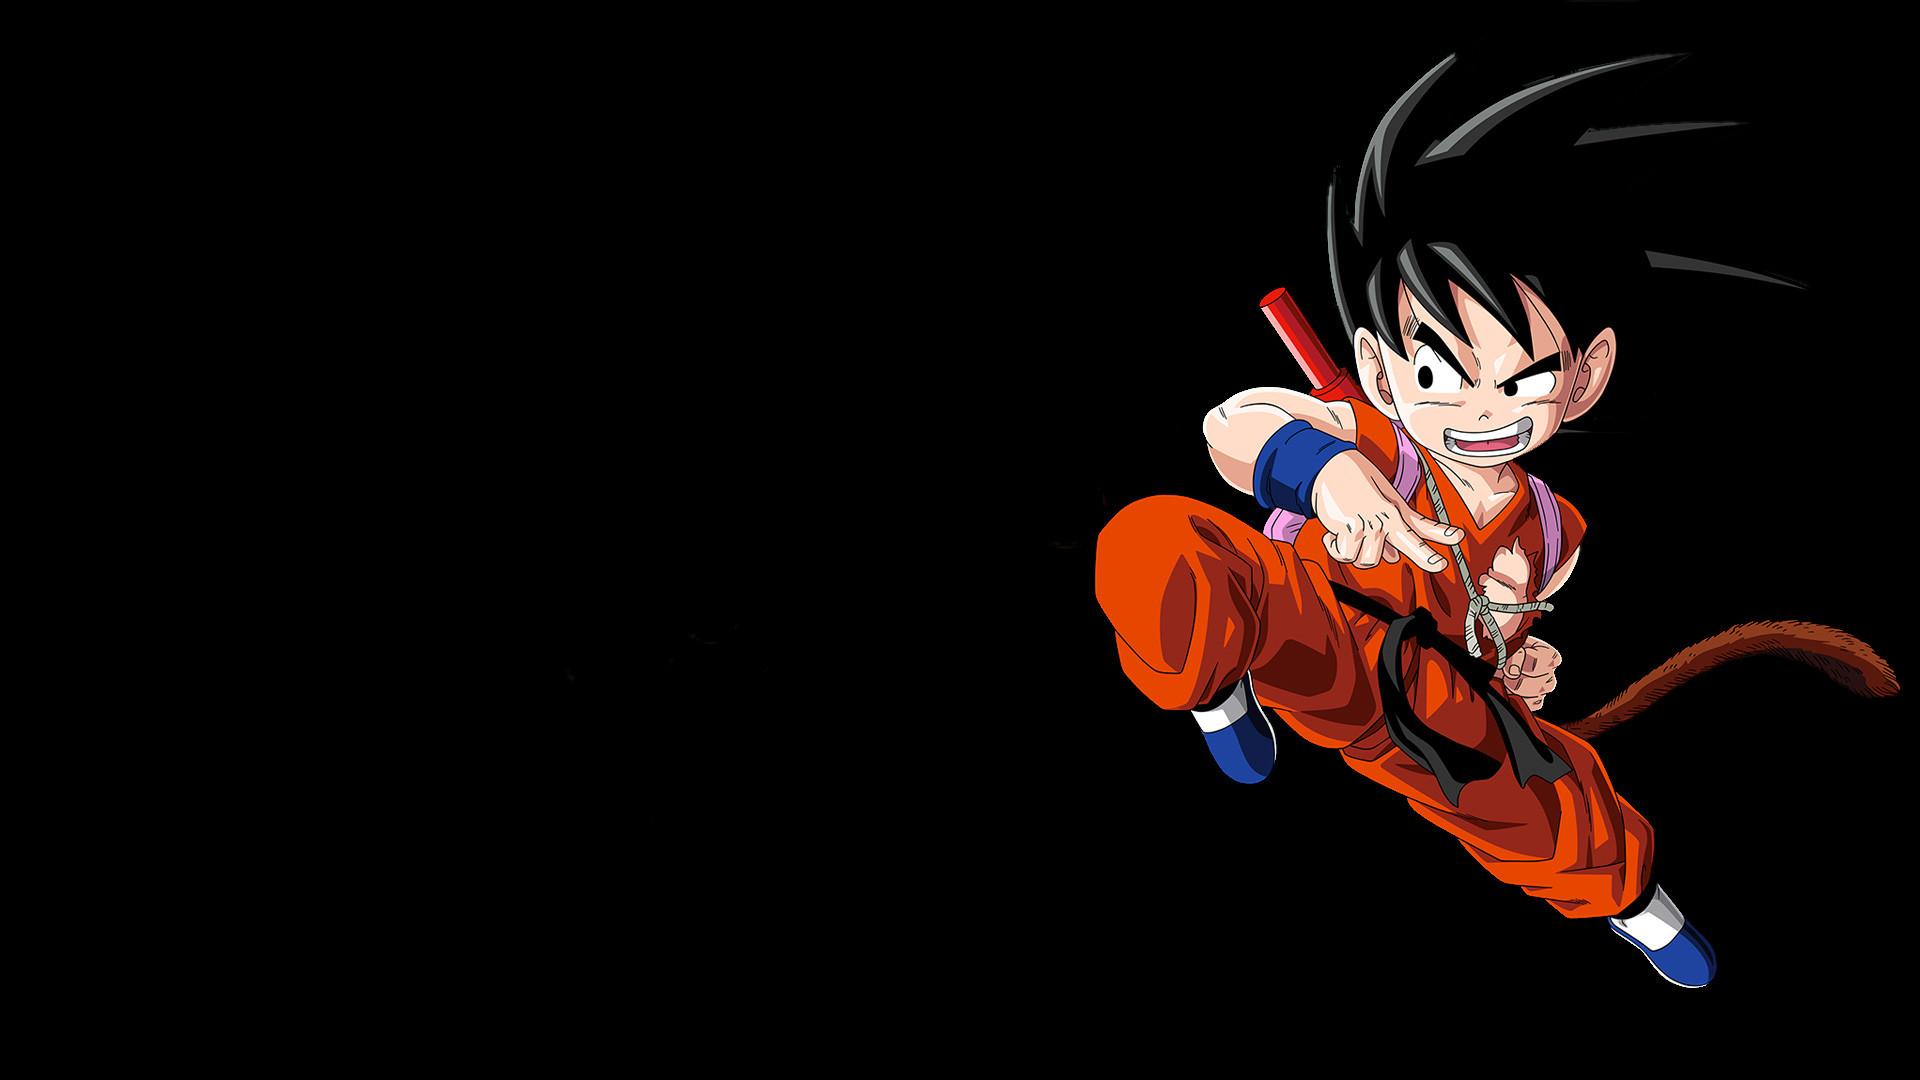 Best 25+ Goku wallpaper hd ideas on Pinterest   Wallpaper anime hd, Mangas  hd and Dragon ball